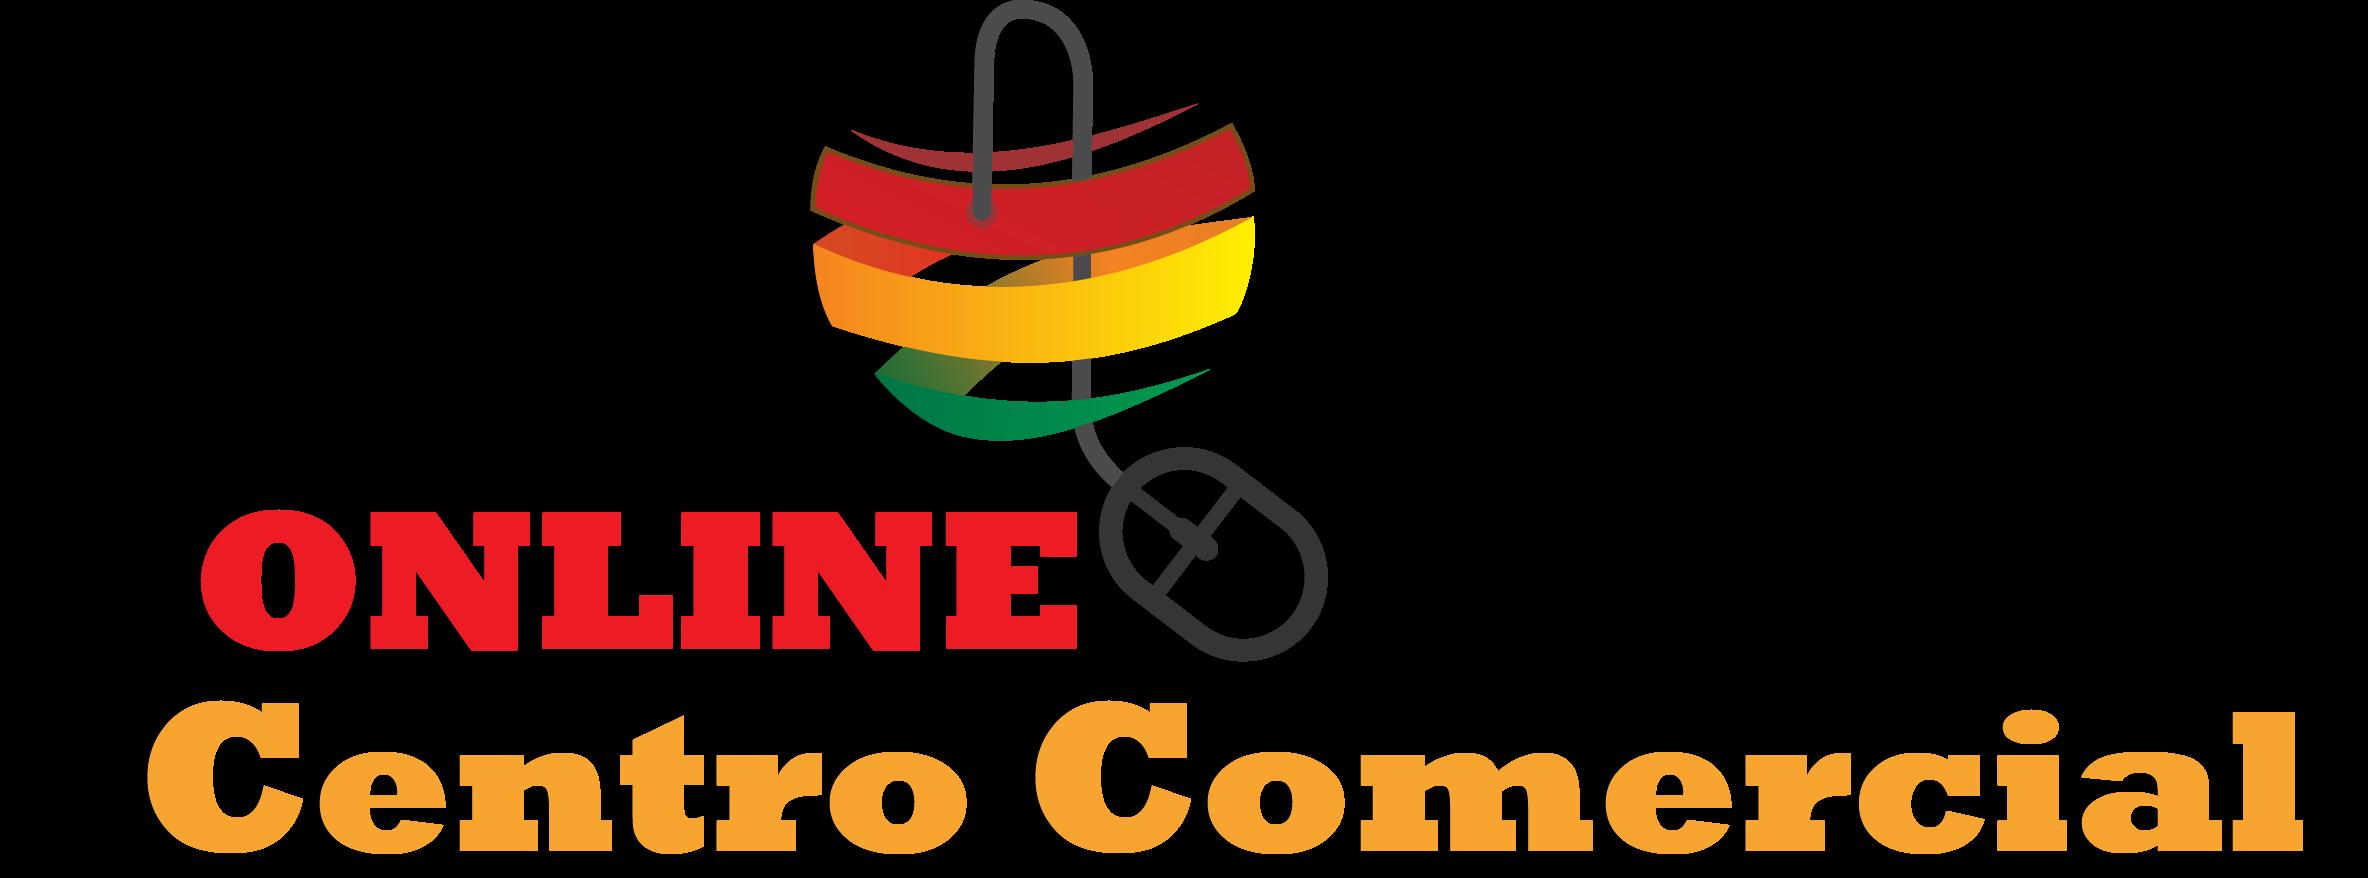 Centro Comercial Online